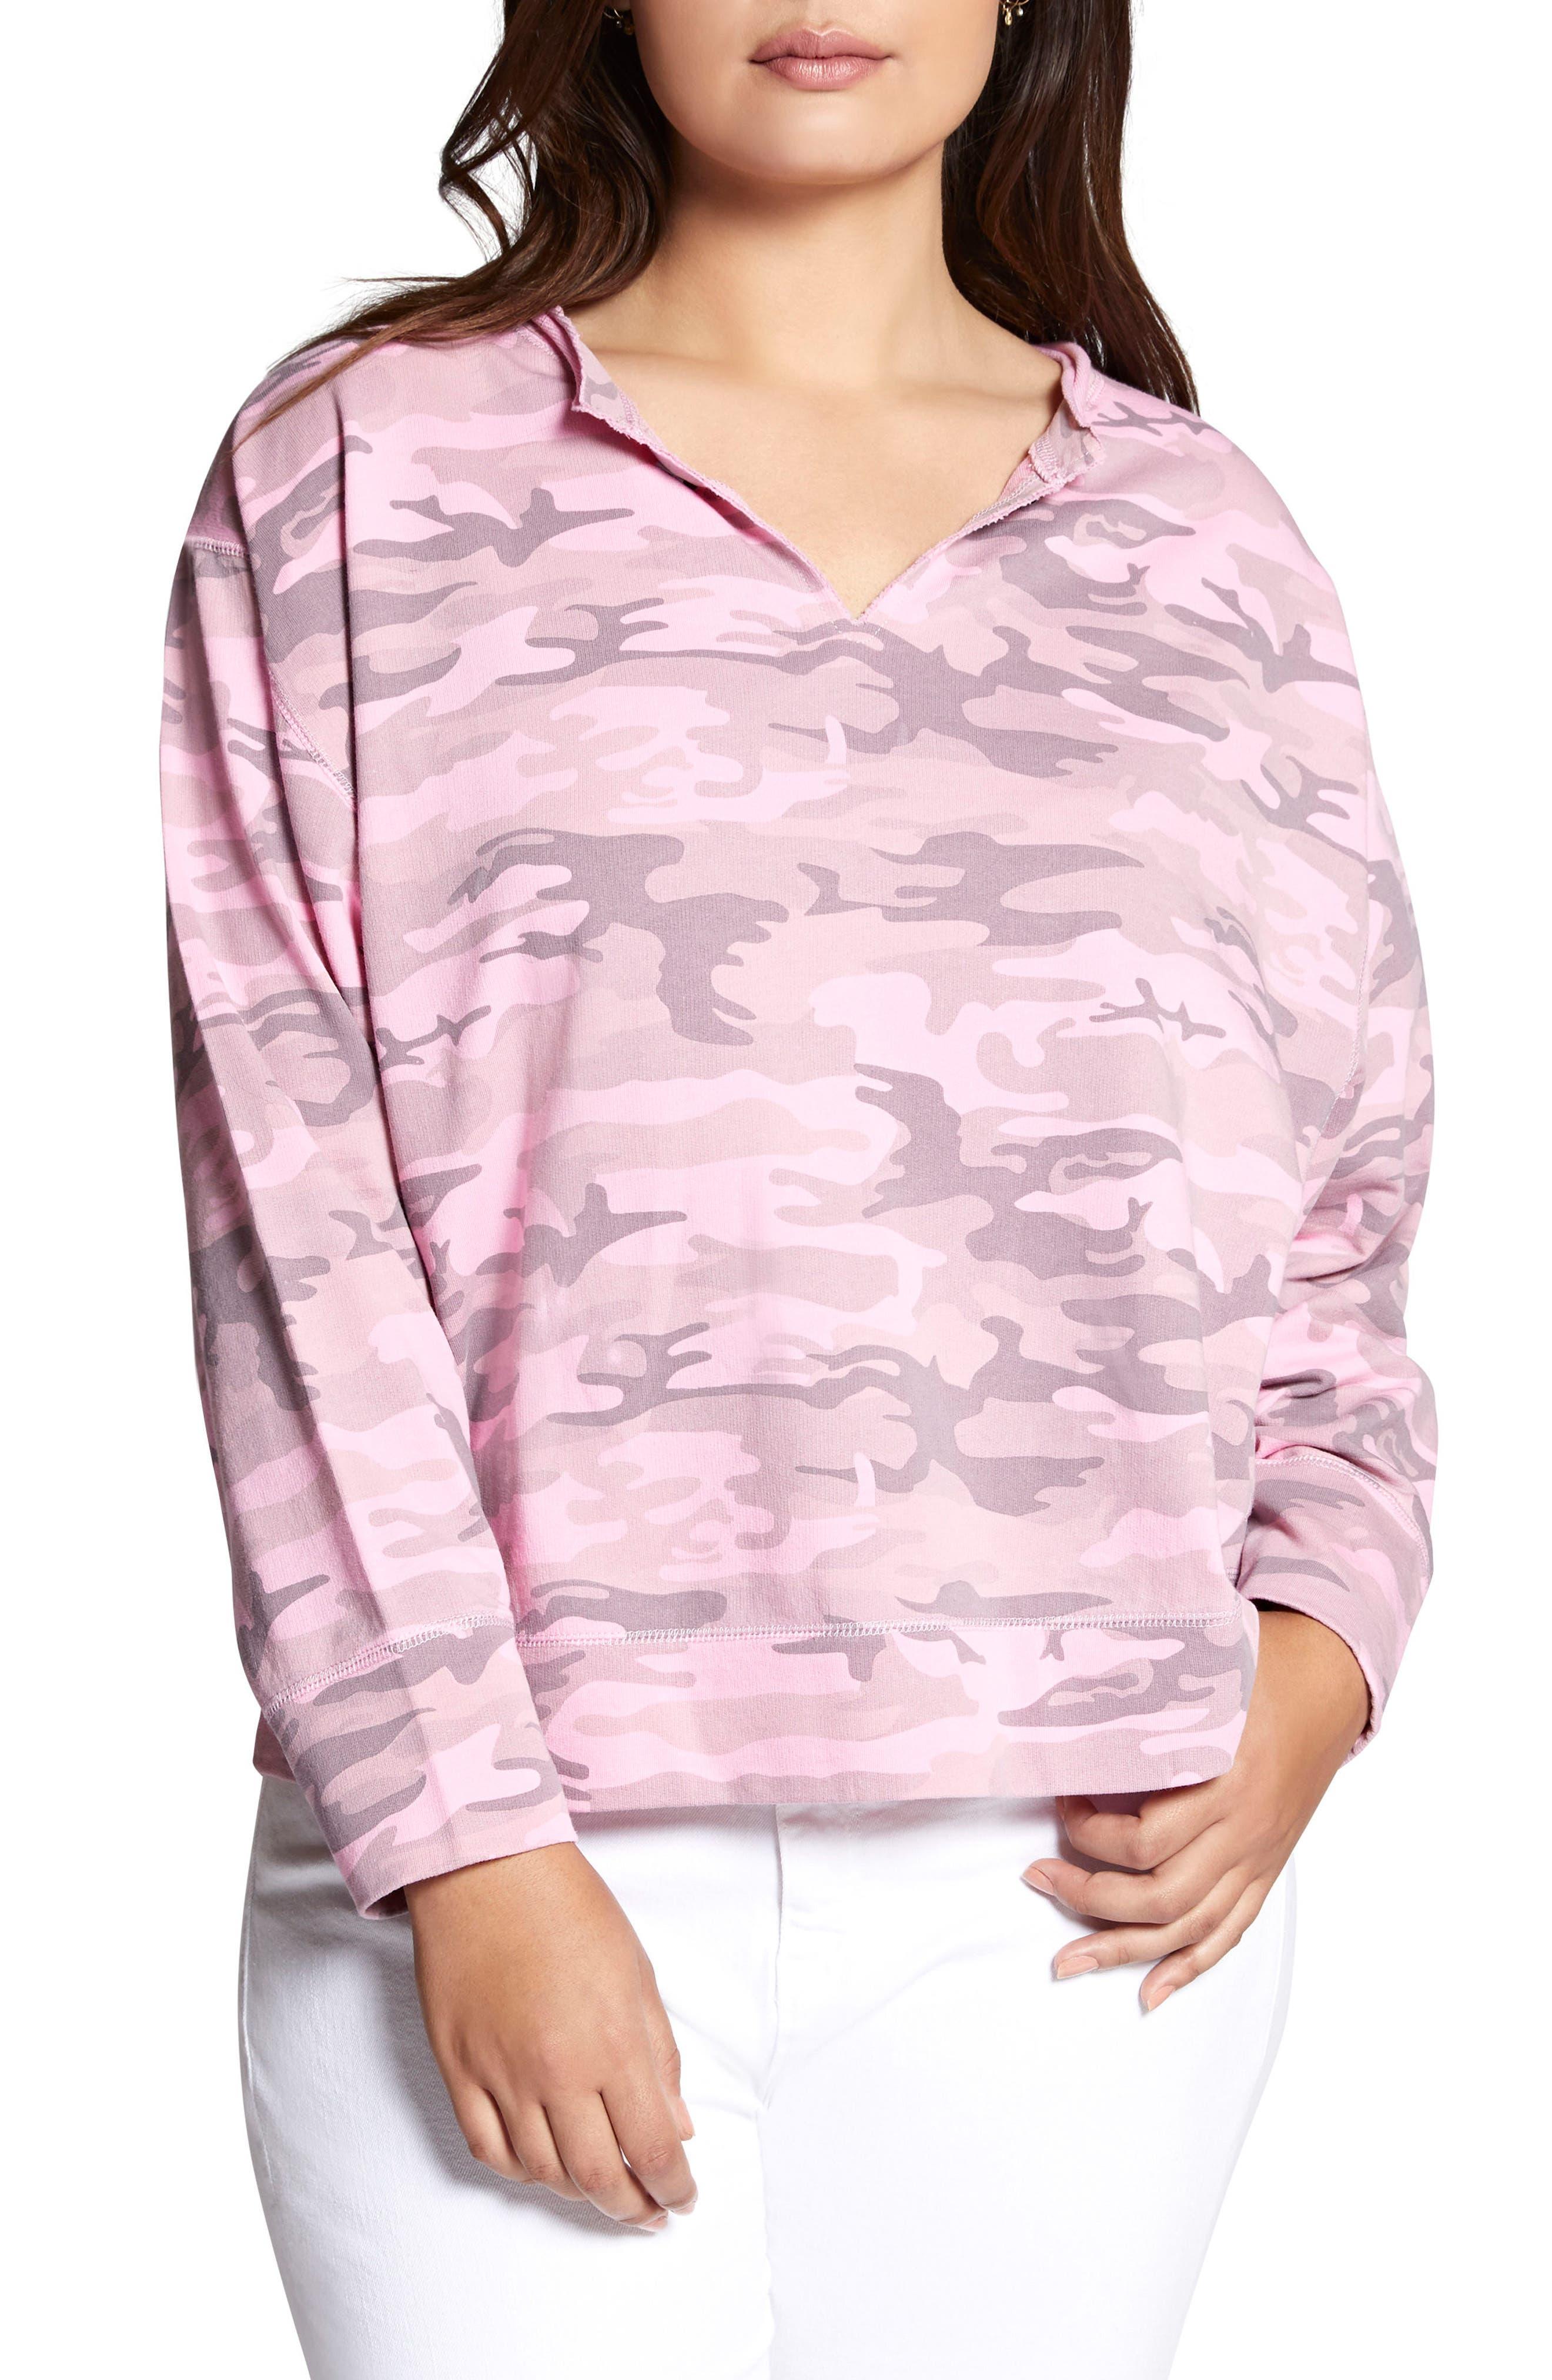 Breslin Split Neck Sweatshirt,                             Main thumbnail 1, color,                             Wild Cherry Camo